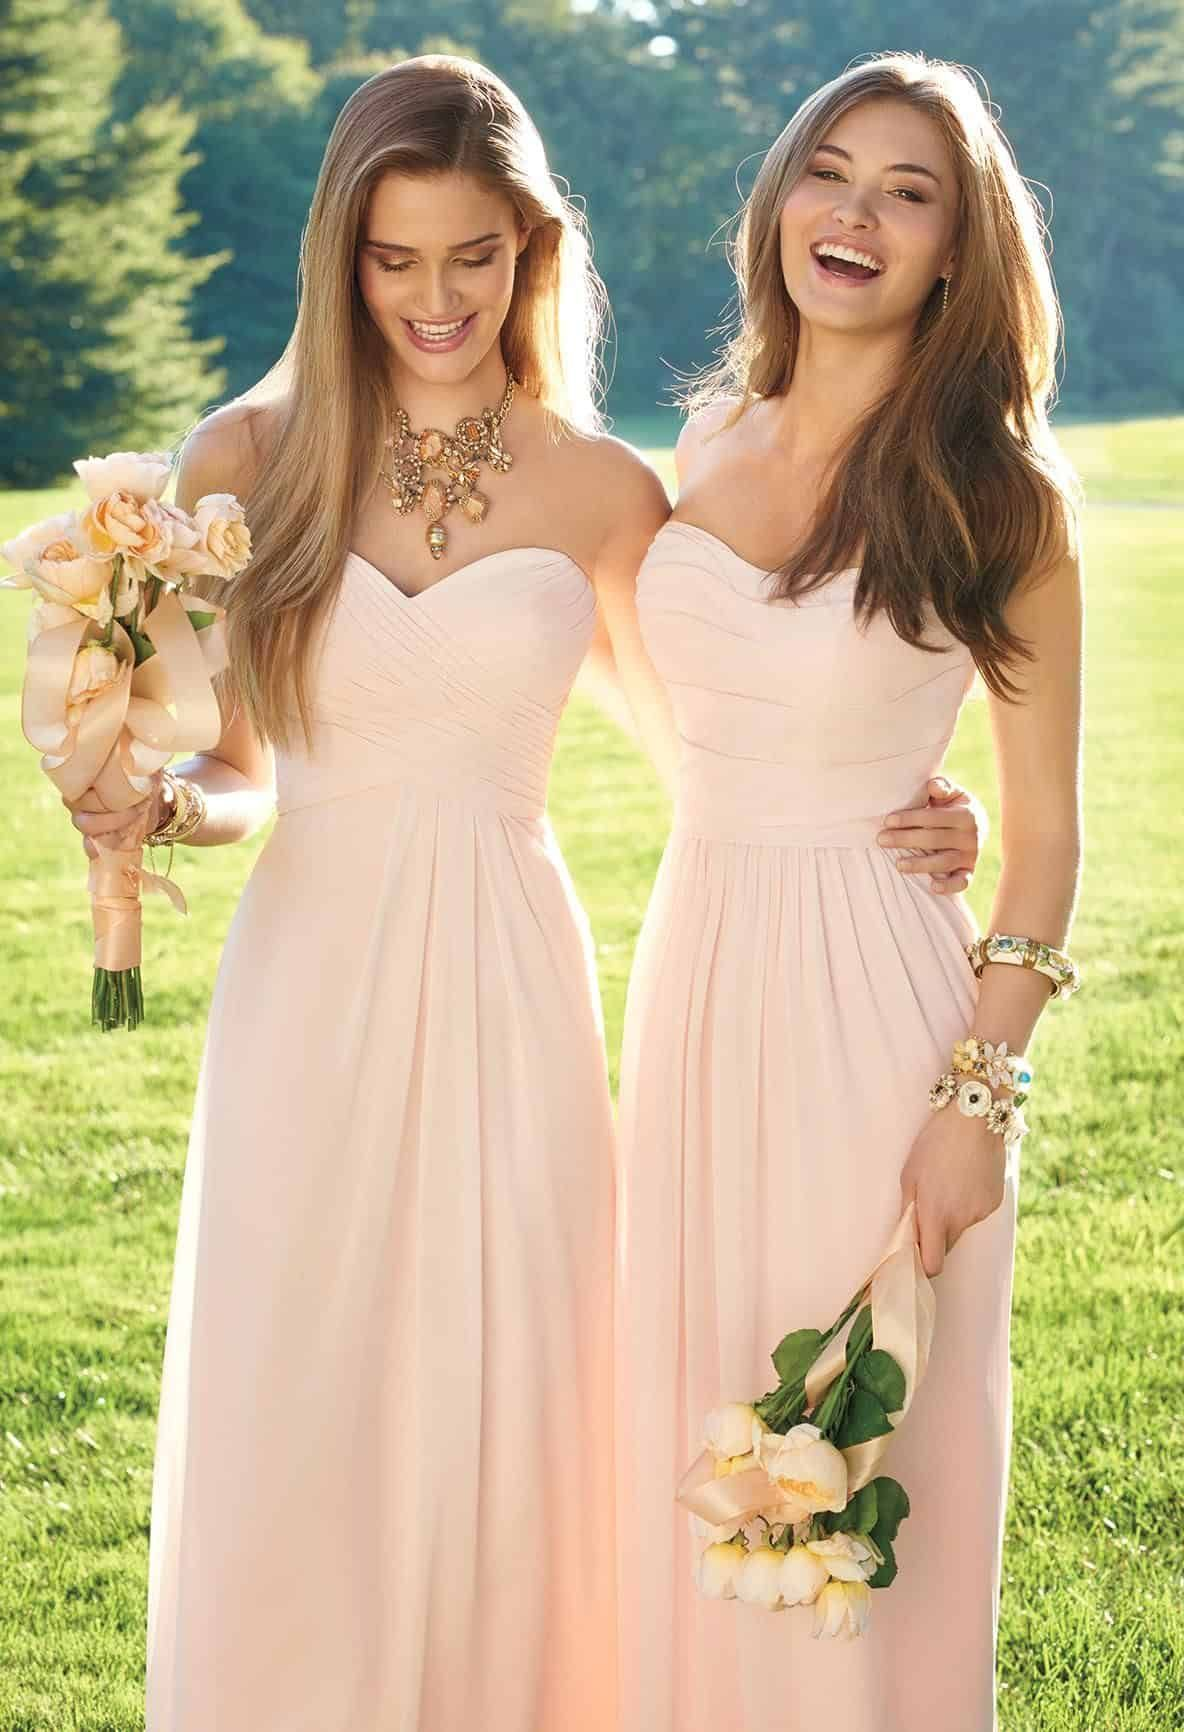 40+ cute Pink Bridesmaid Dresses  PinkBridesmaidDresses  BridesmaidDresses 0d103cb0b7de